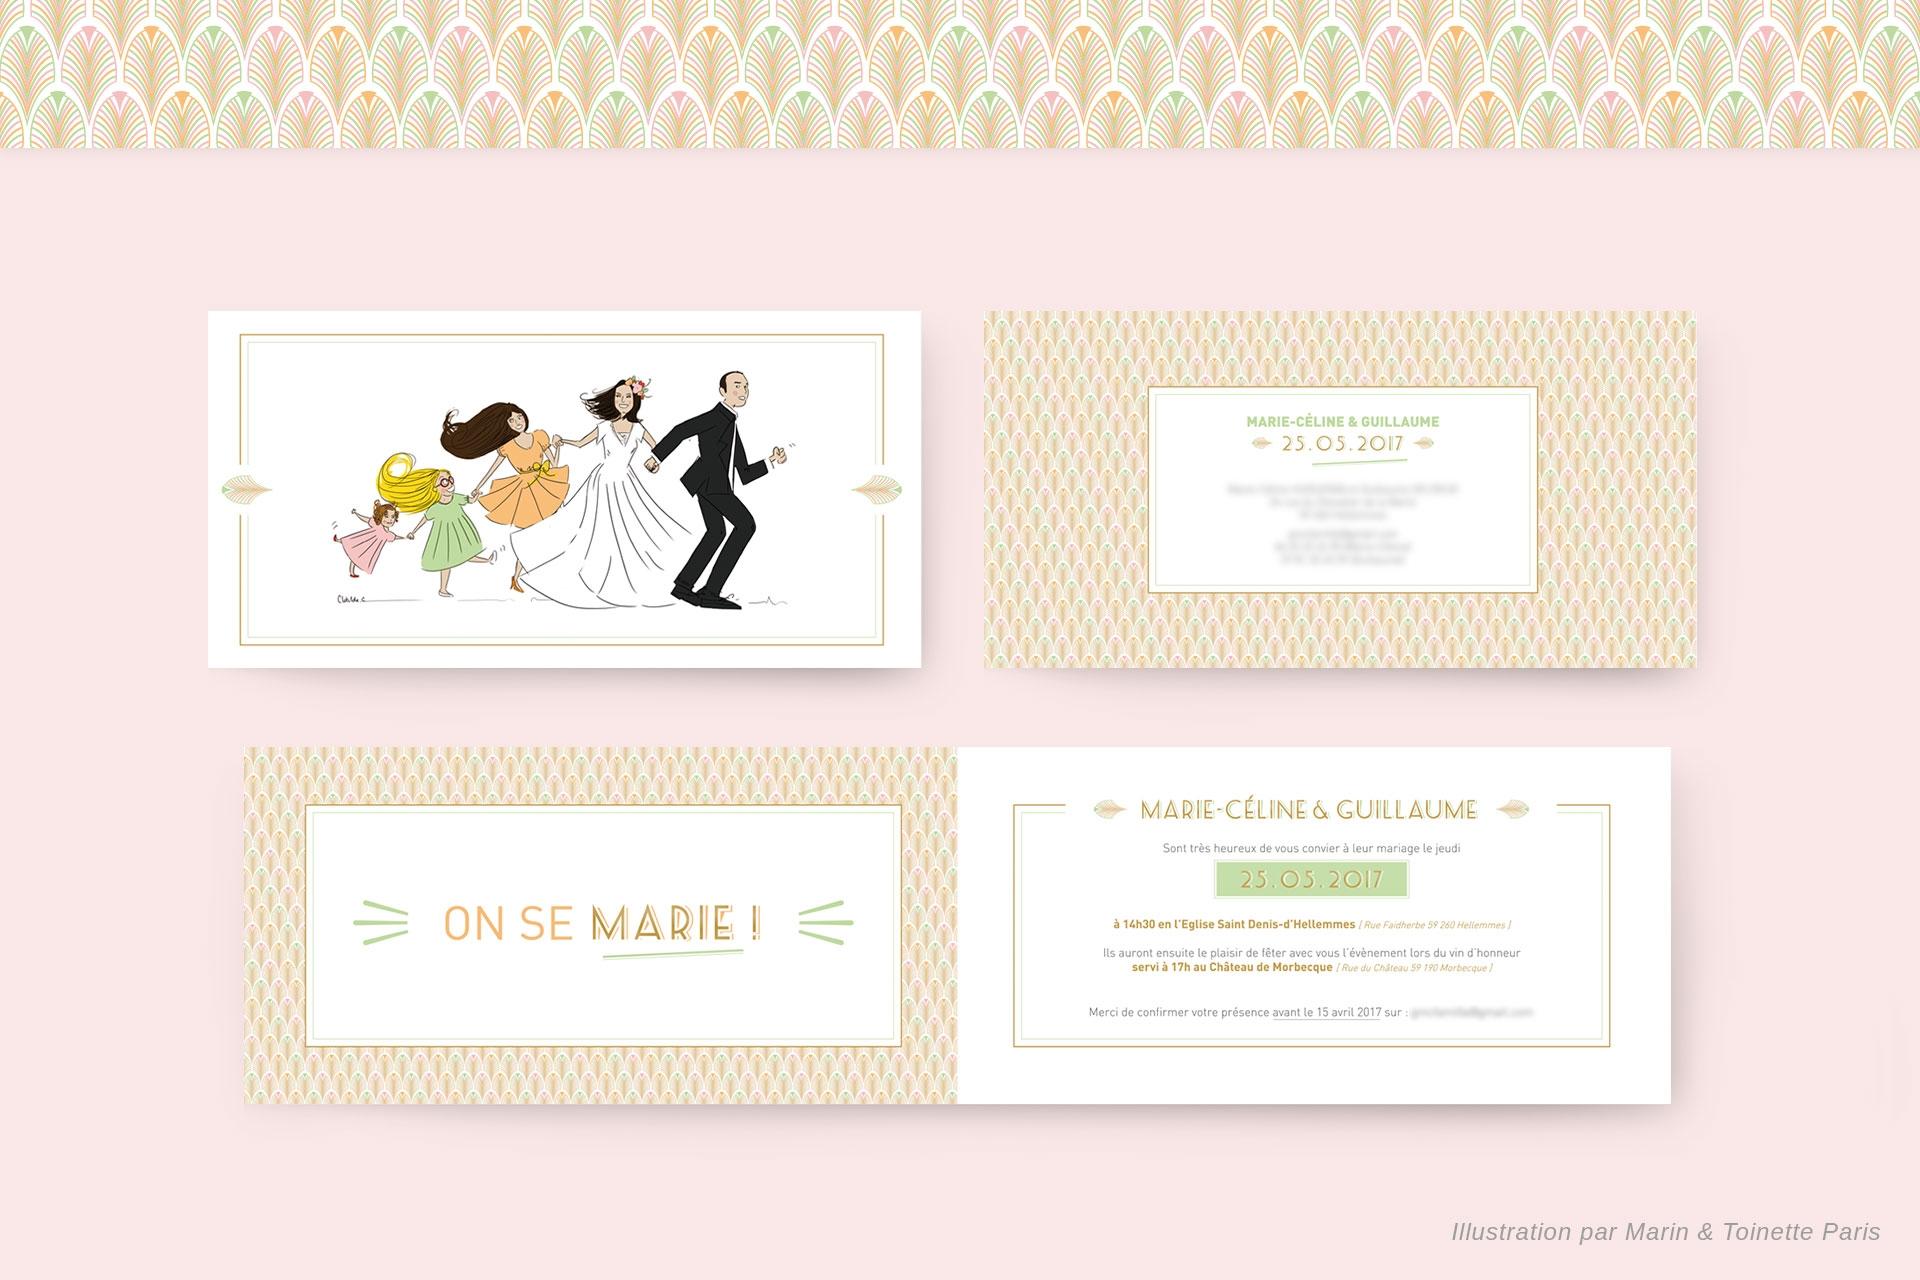 particuliers-creas-faire-part-mariage-mariceceline&guillaume-invitation